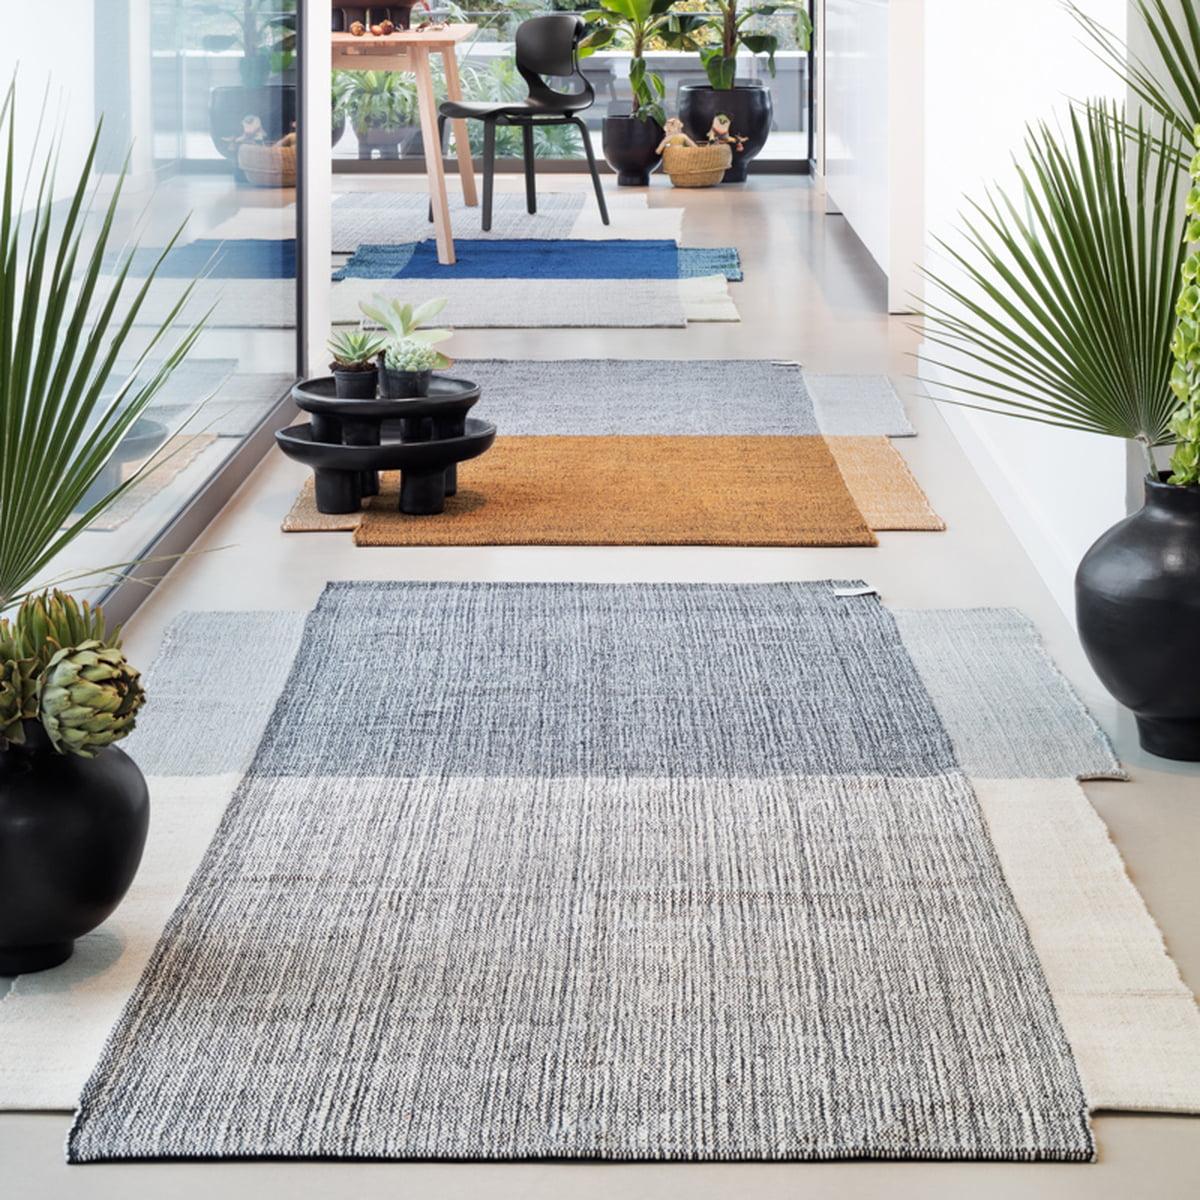 nobsa teppich von ames connox shop. Black Bedroom Furniture Sets. Home Design Ideas